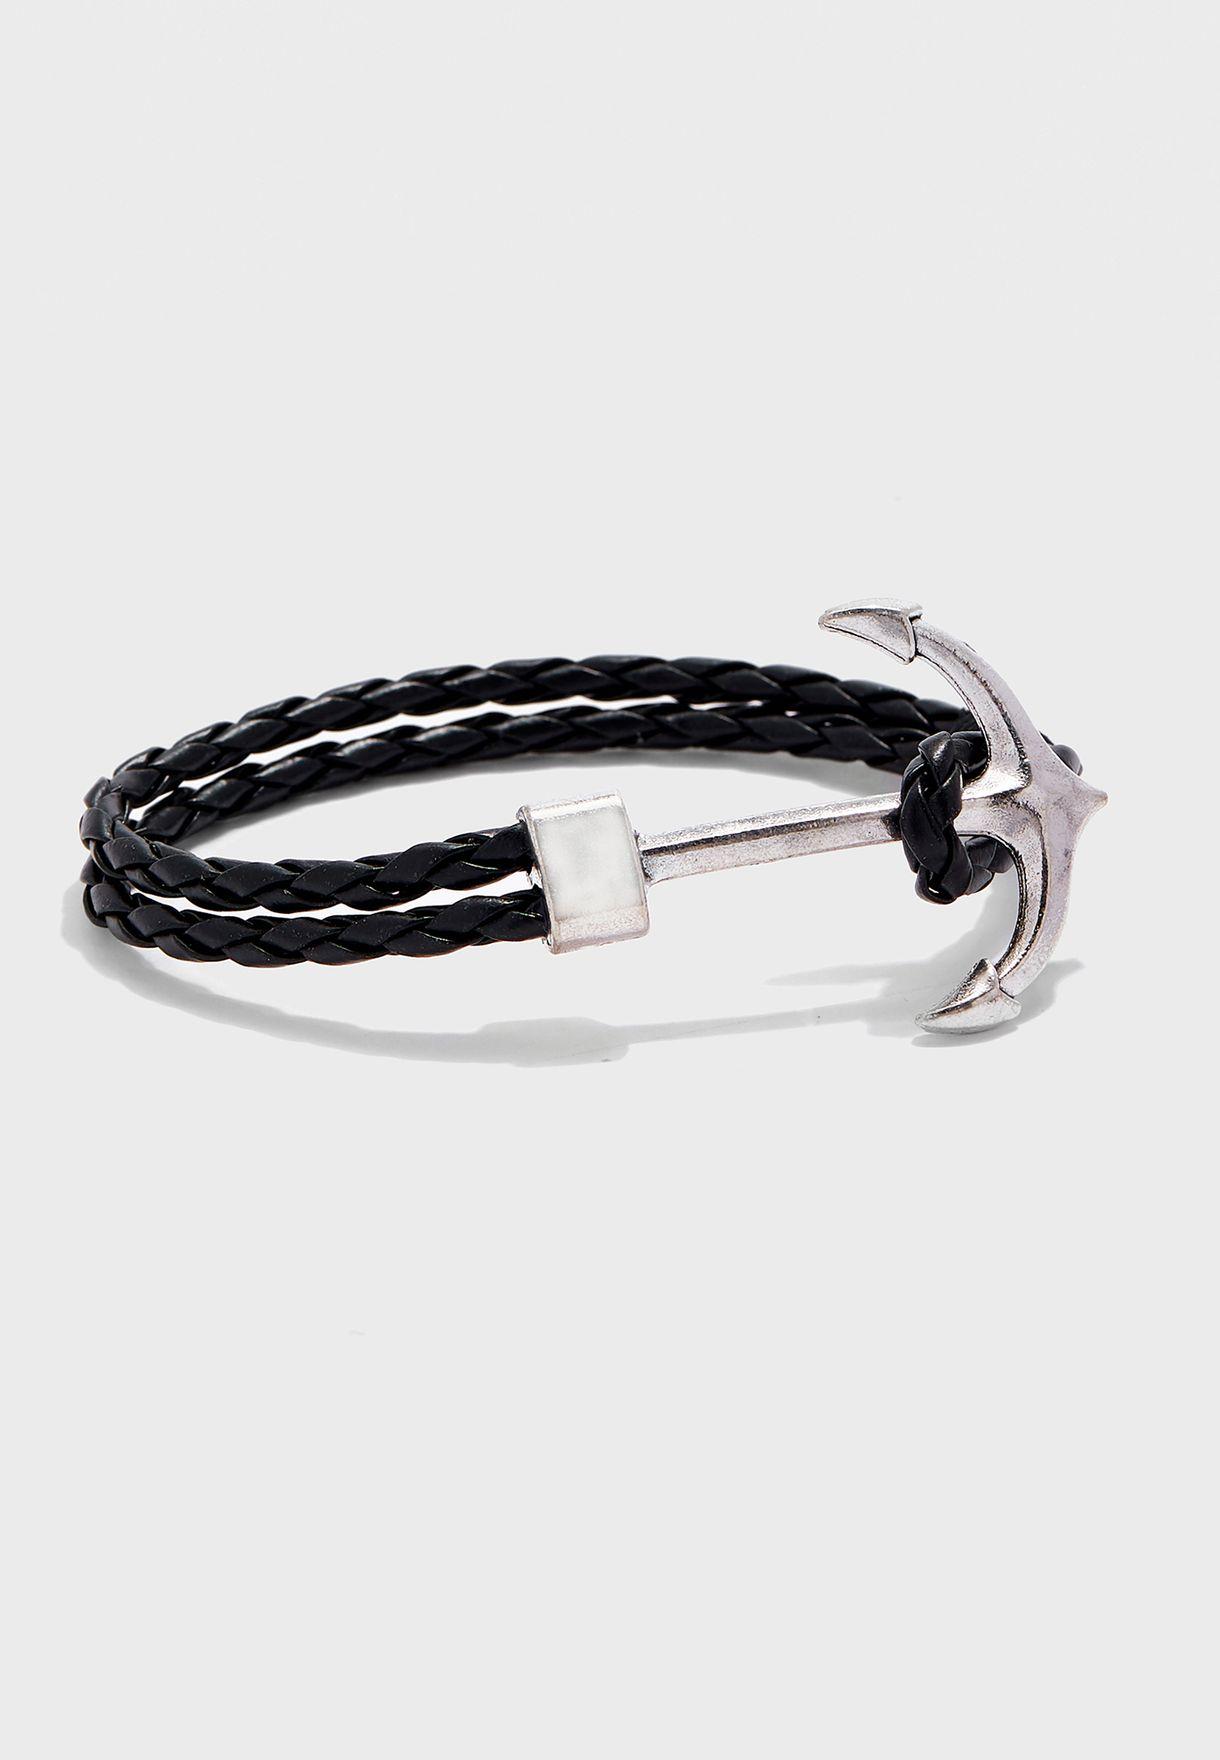 Kenricus Bracelet Set